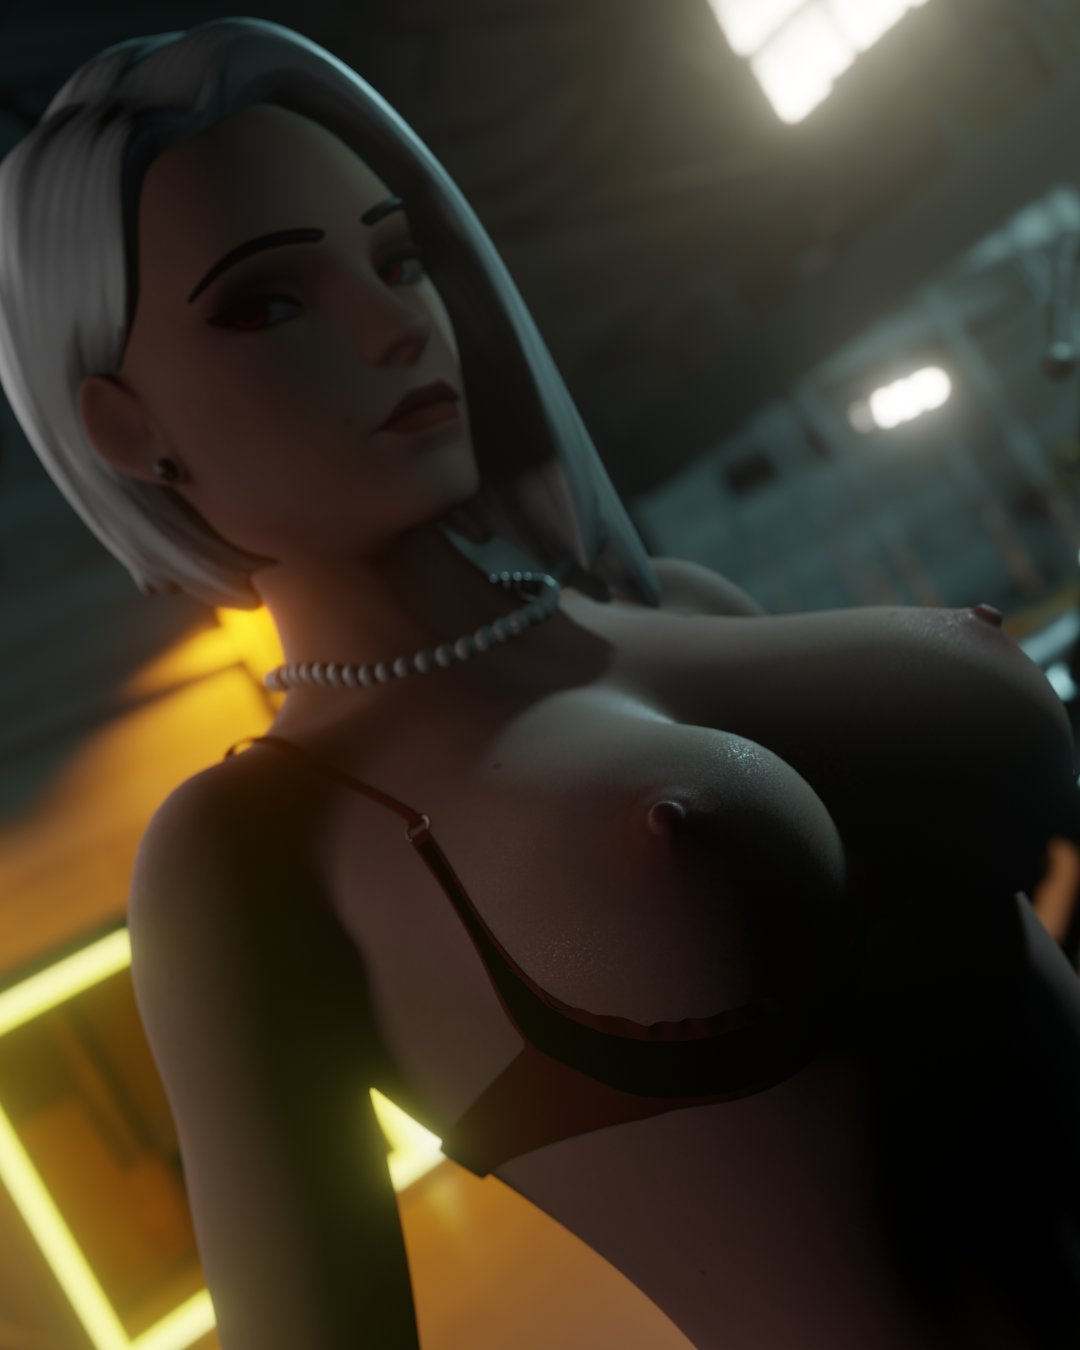 ashe-hot-hentai-–-shelf-bra,-breasts,-breasts,-bra.